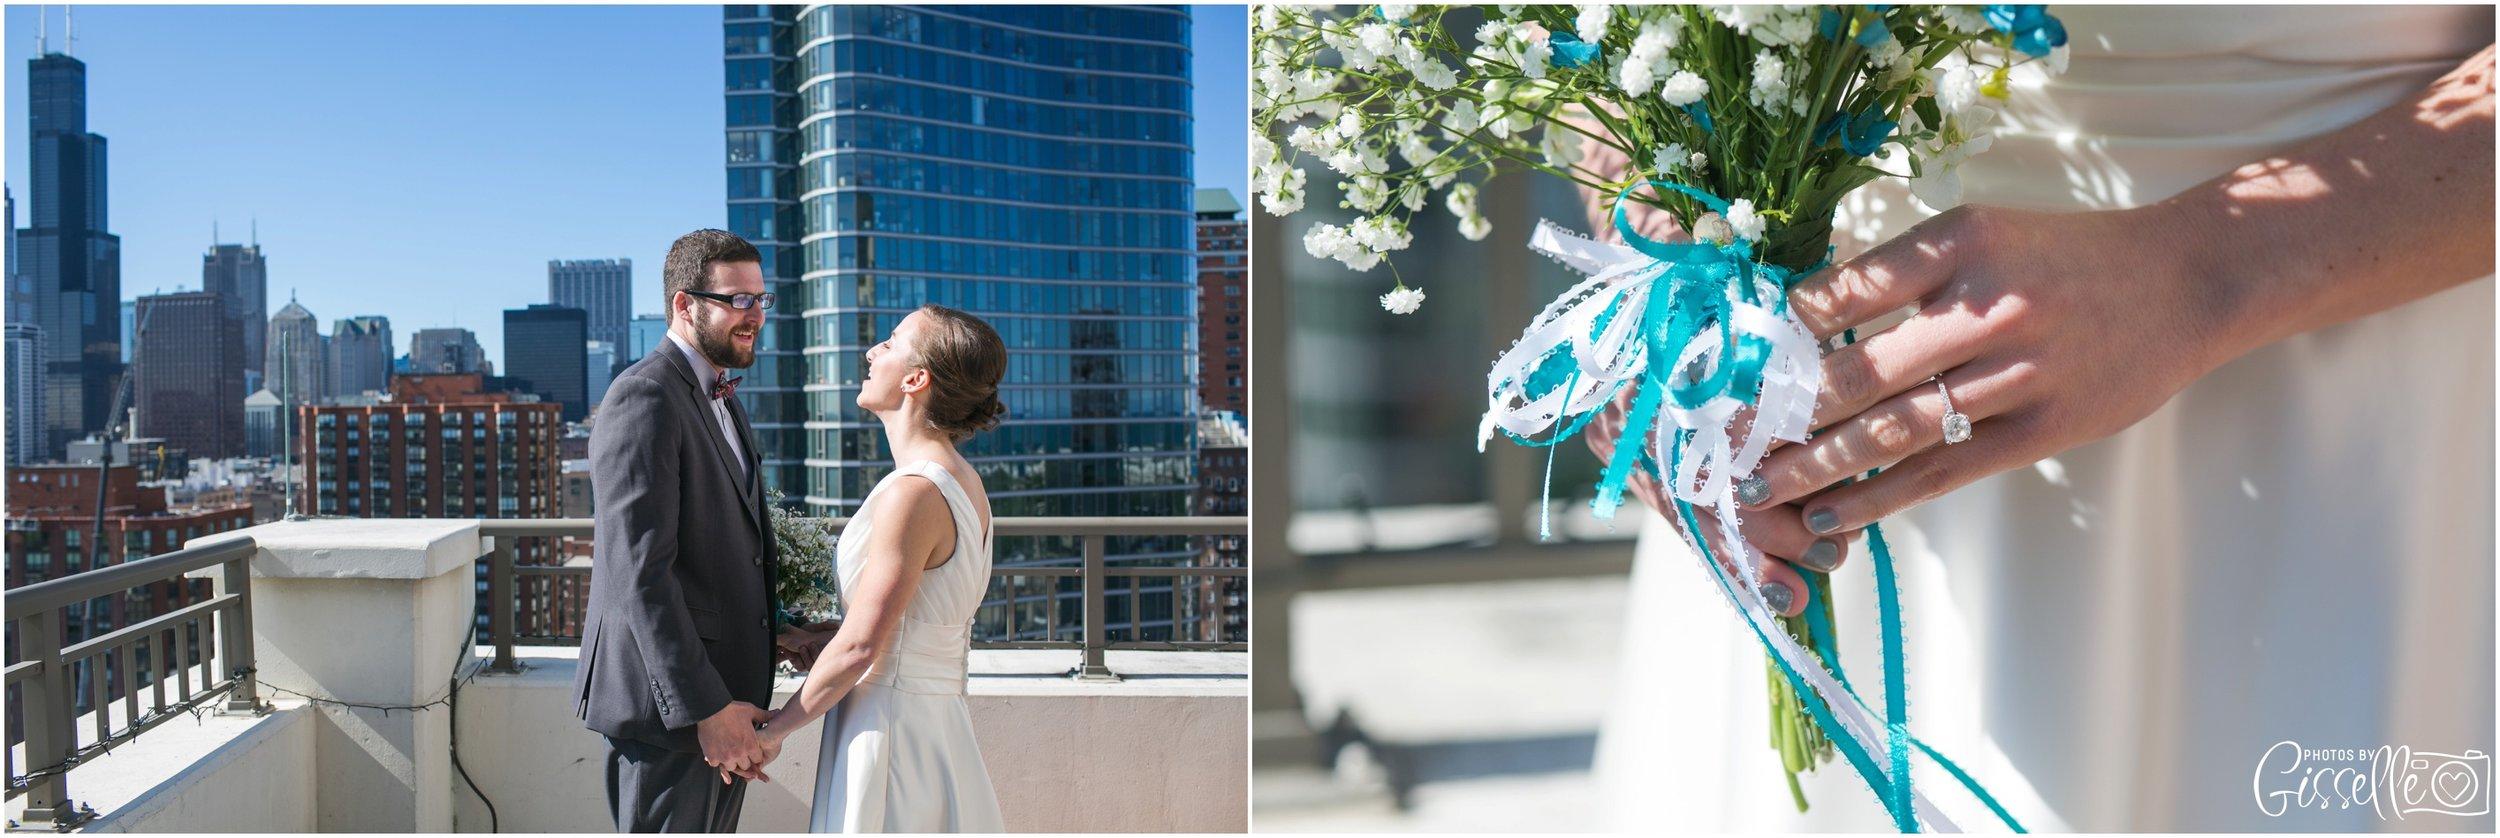 Chicago Rooftop Wedding_0069.jpg